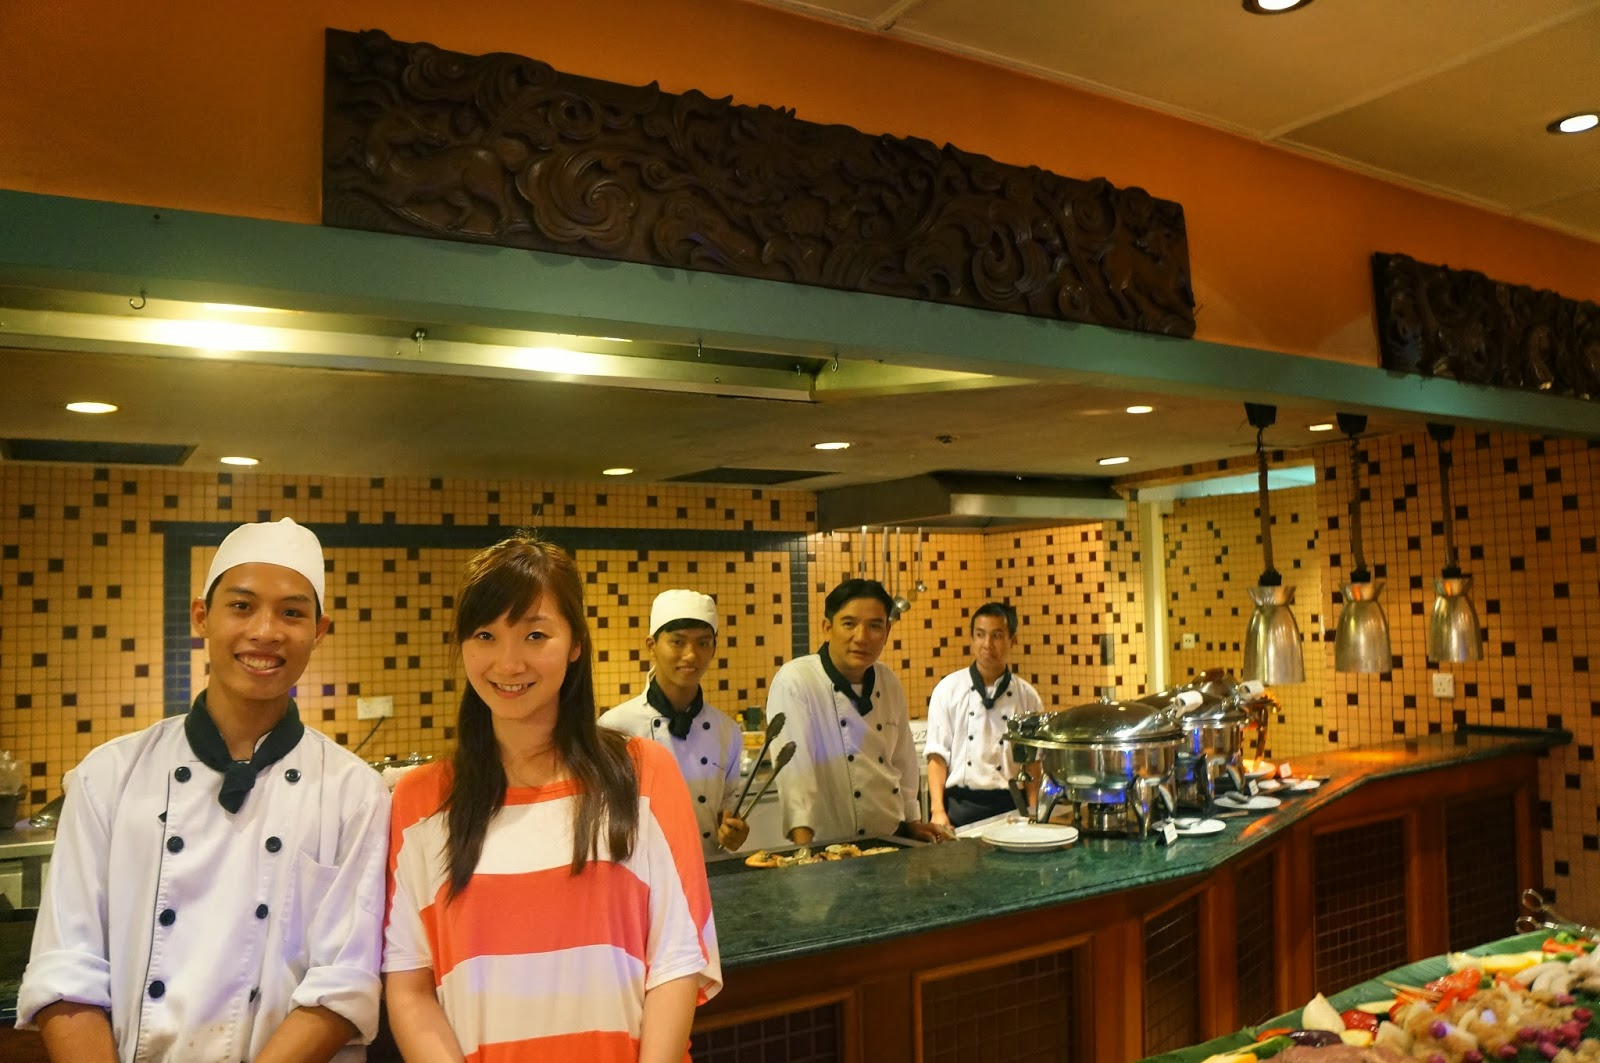 MissJu旅行日記: 越南峴港 五日四夜之旅-第一天 Furama Resort Danang 有驚喜的海鮮自助餐